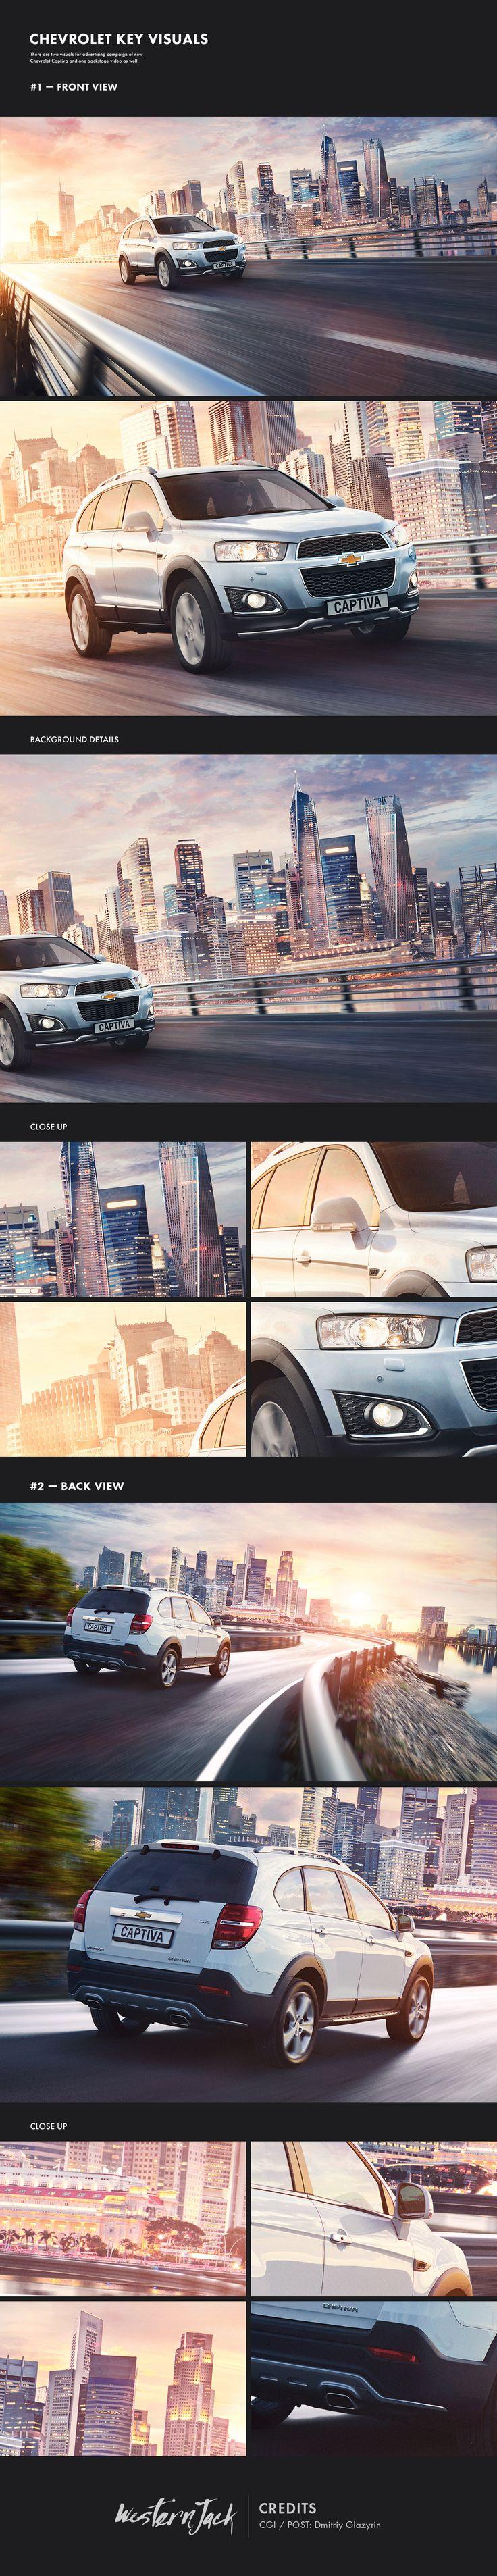 Chevrolet Captiva, Poster © ДмитрийГлазырин